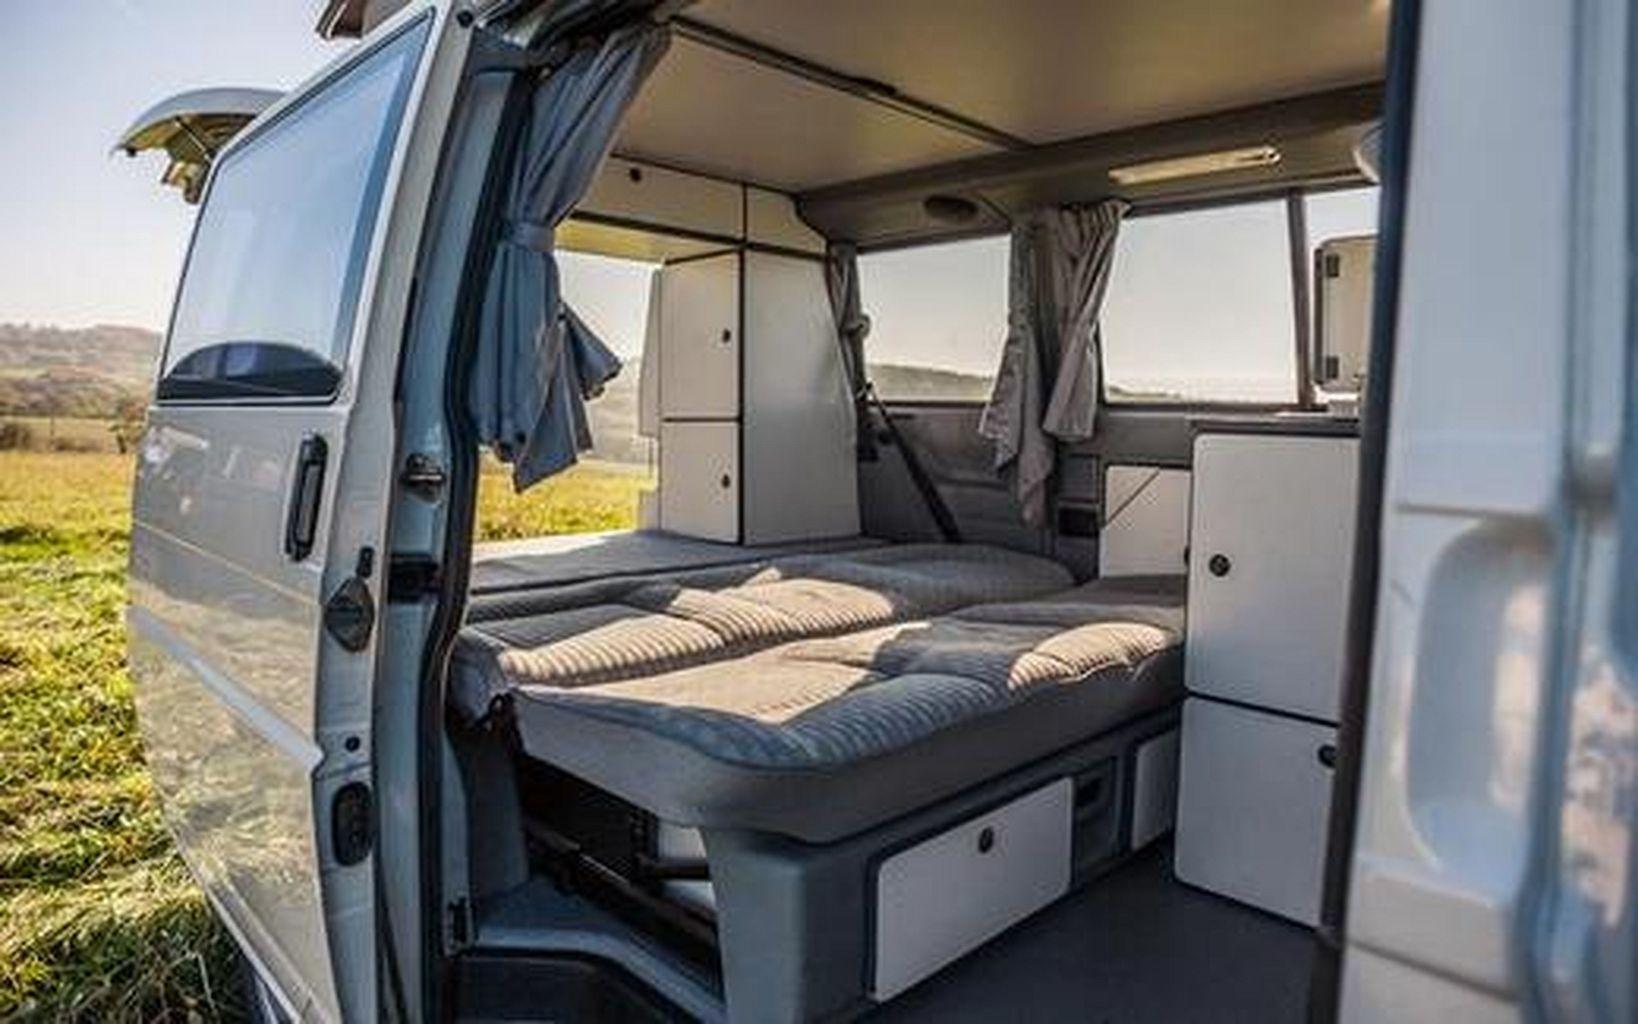 vw bus ausbau diy and ideas for you 81 van conversions t4 multivan vw bus umbau und wohnmobil. Black Bedroom Furniture Sets. Home Design Ideas